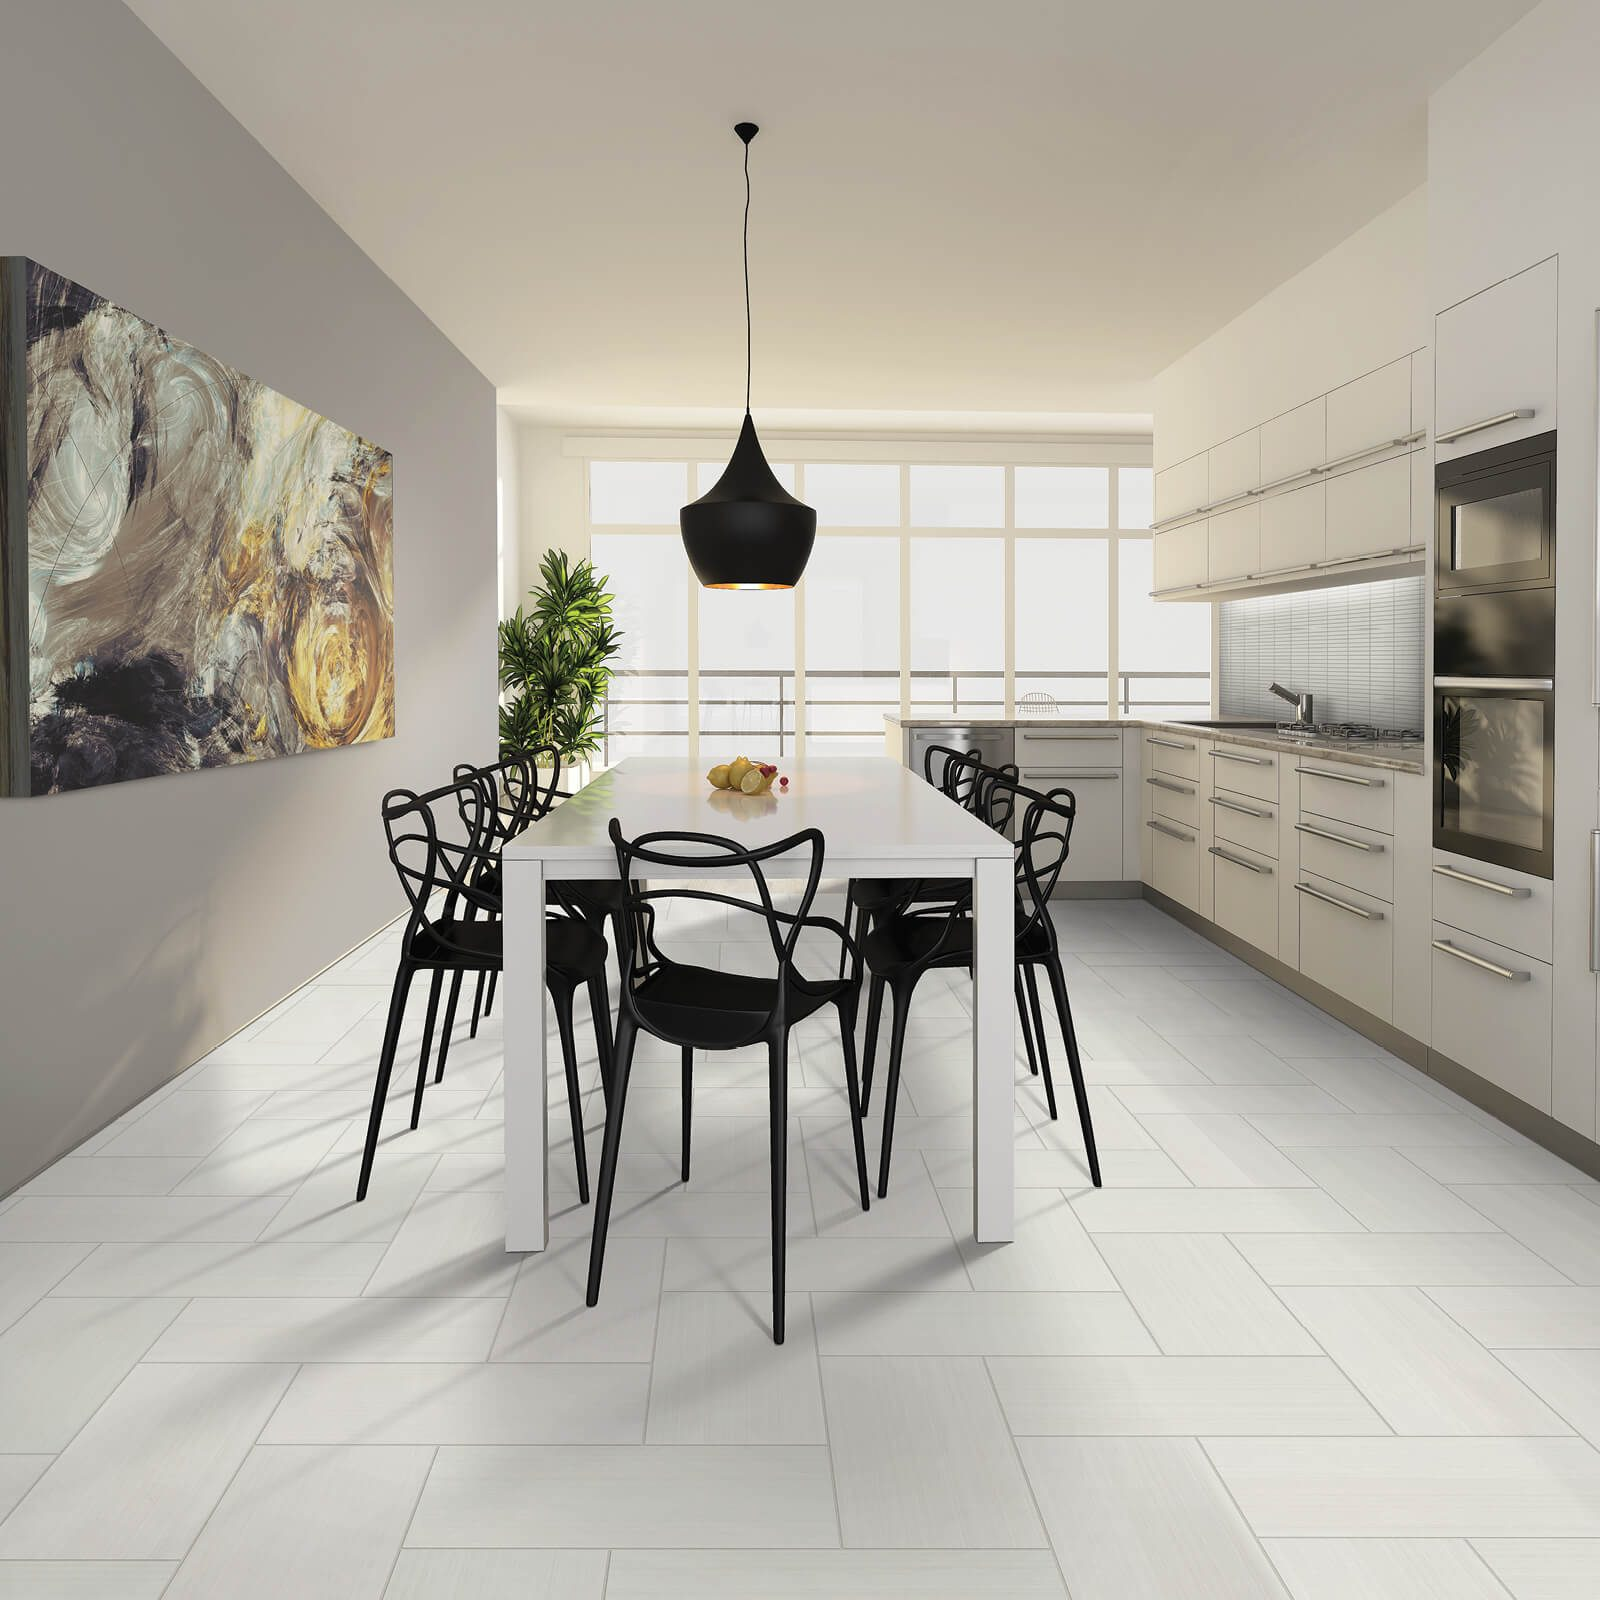 Verzino tile in kitchen | Westport Flooring